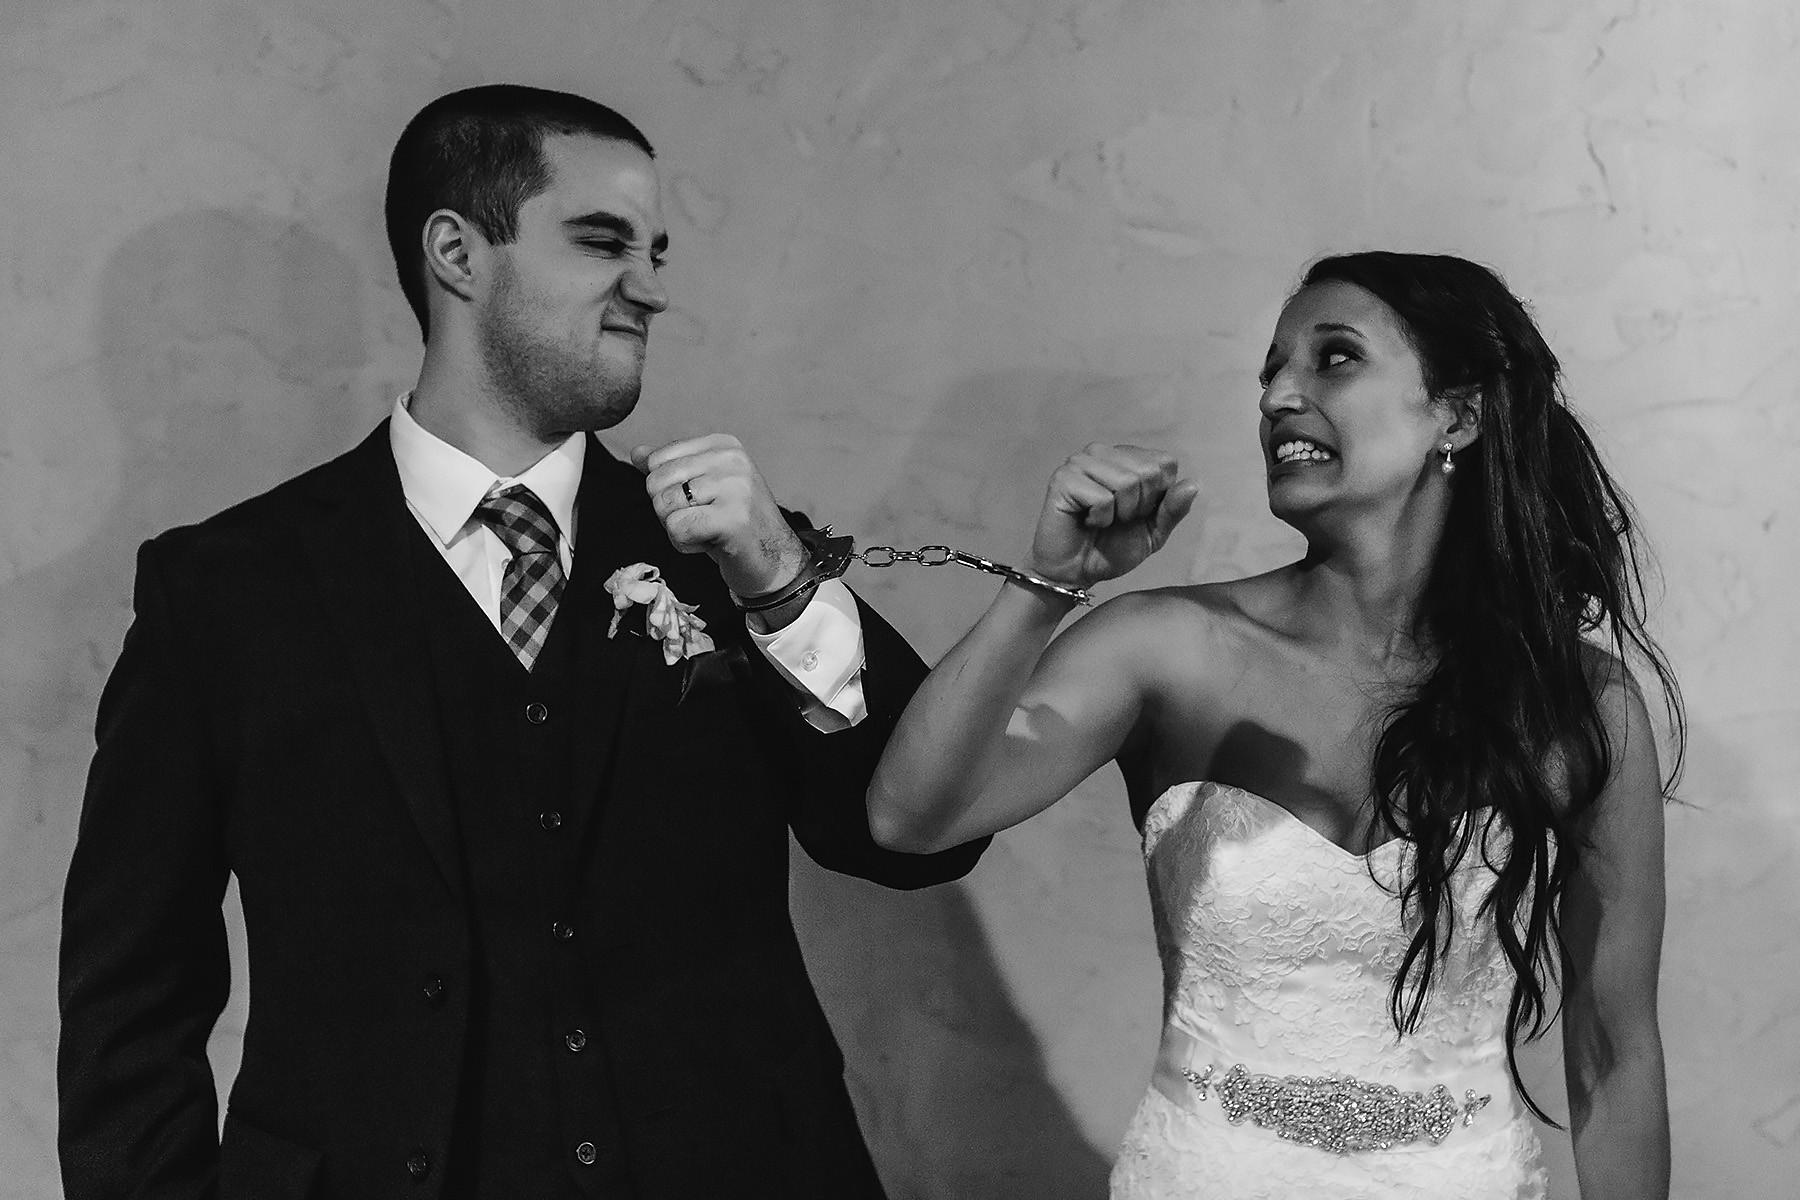 Bride & Groom Handcuffed